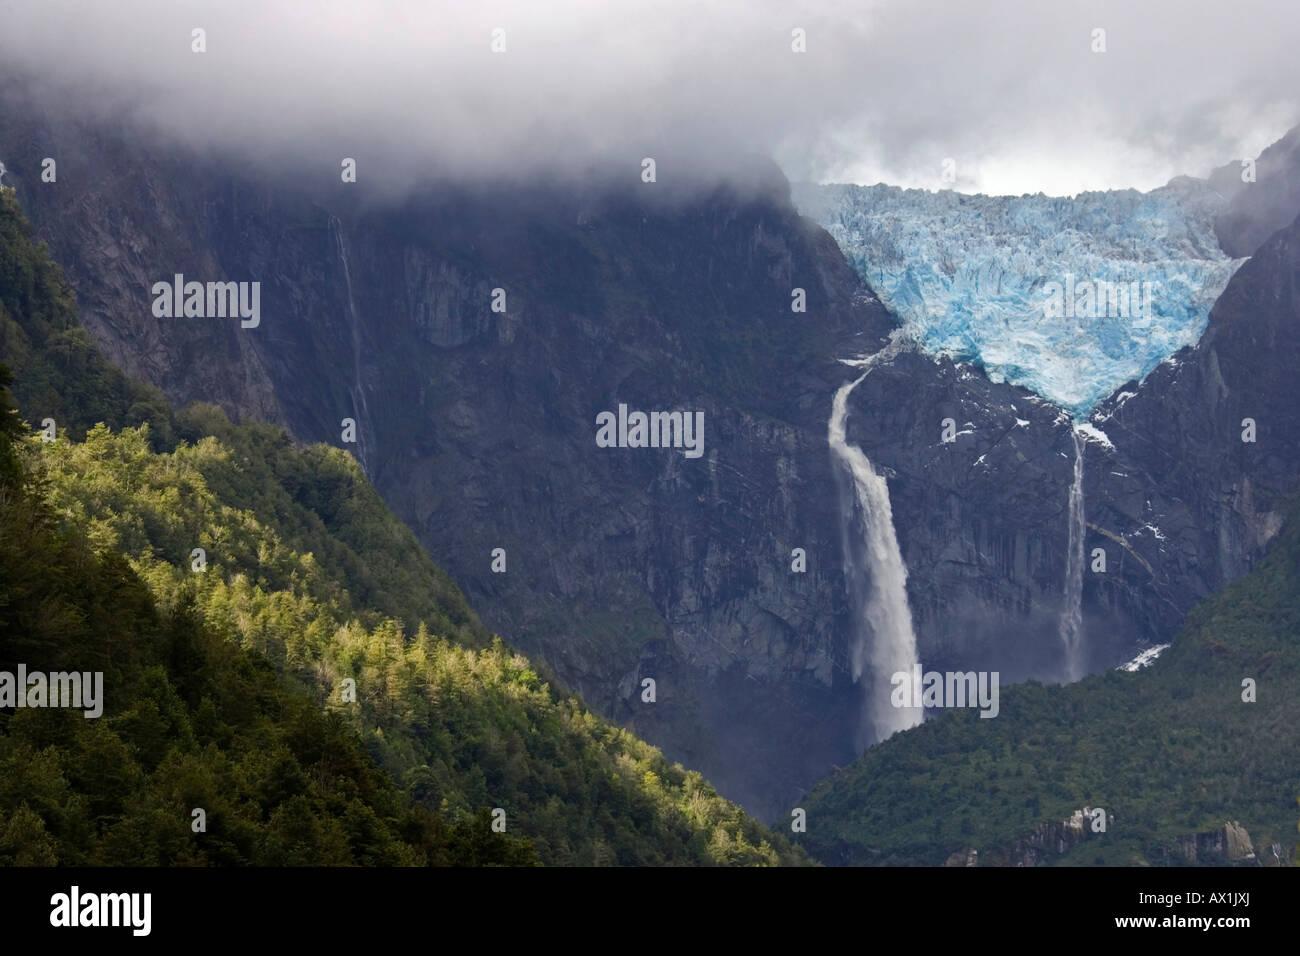 Glacier Ventisquero Colgante, Park Queulat, Carretera Austral, Patagonia, Chile, South America Stock Photo